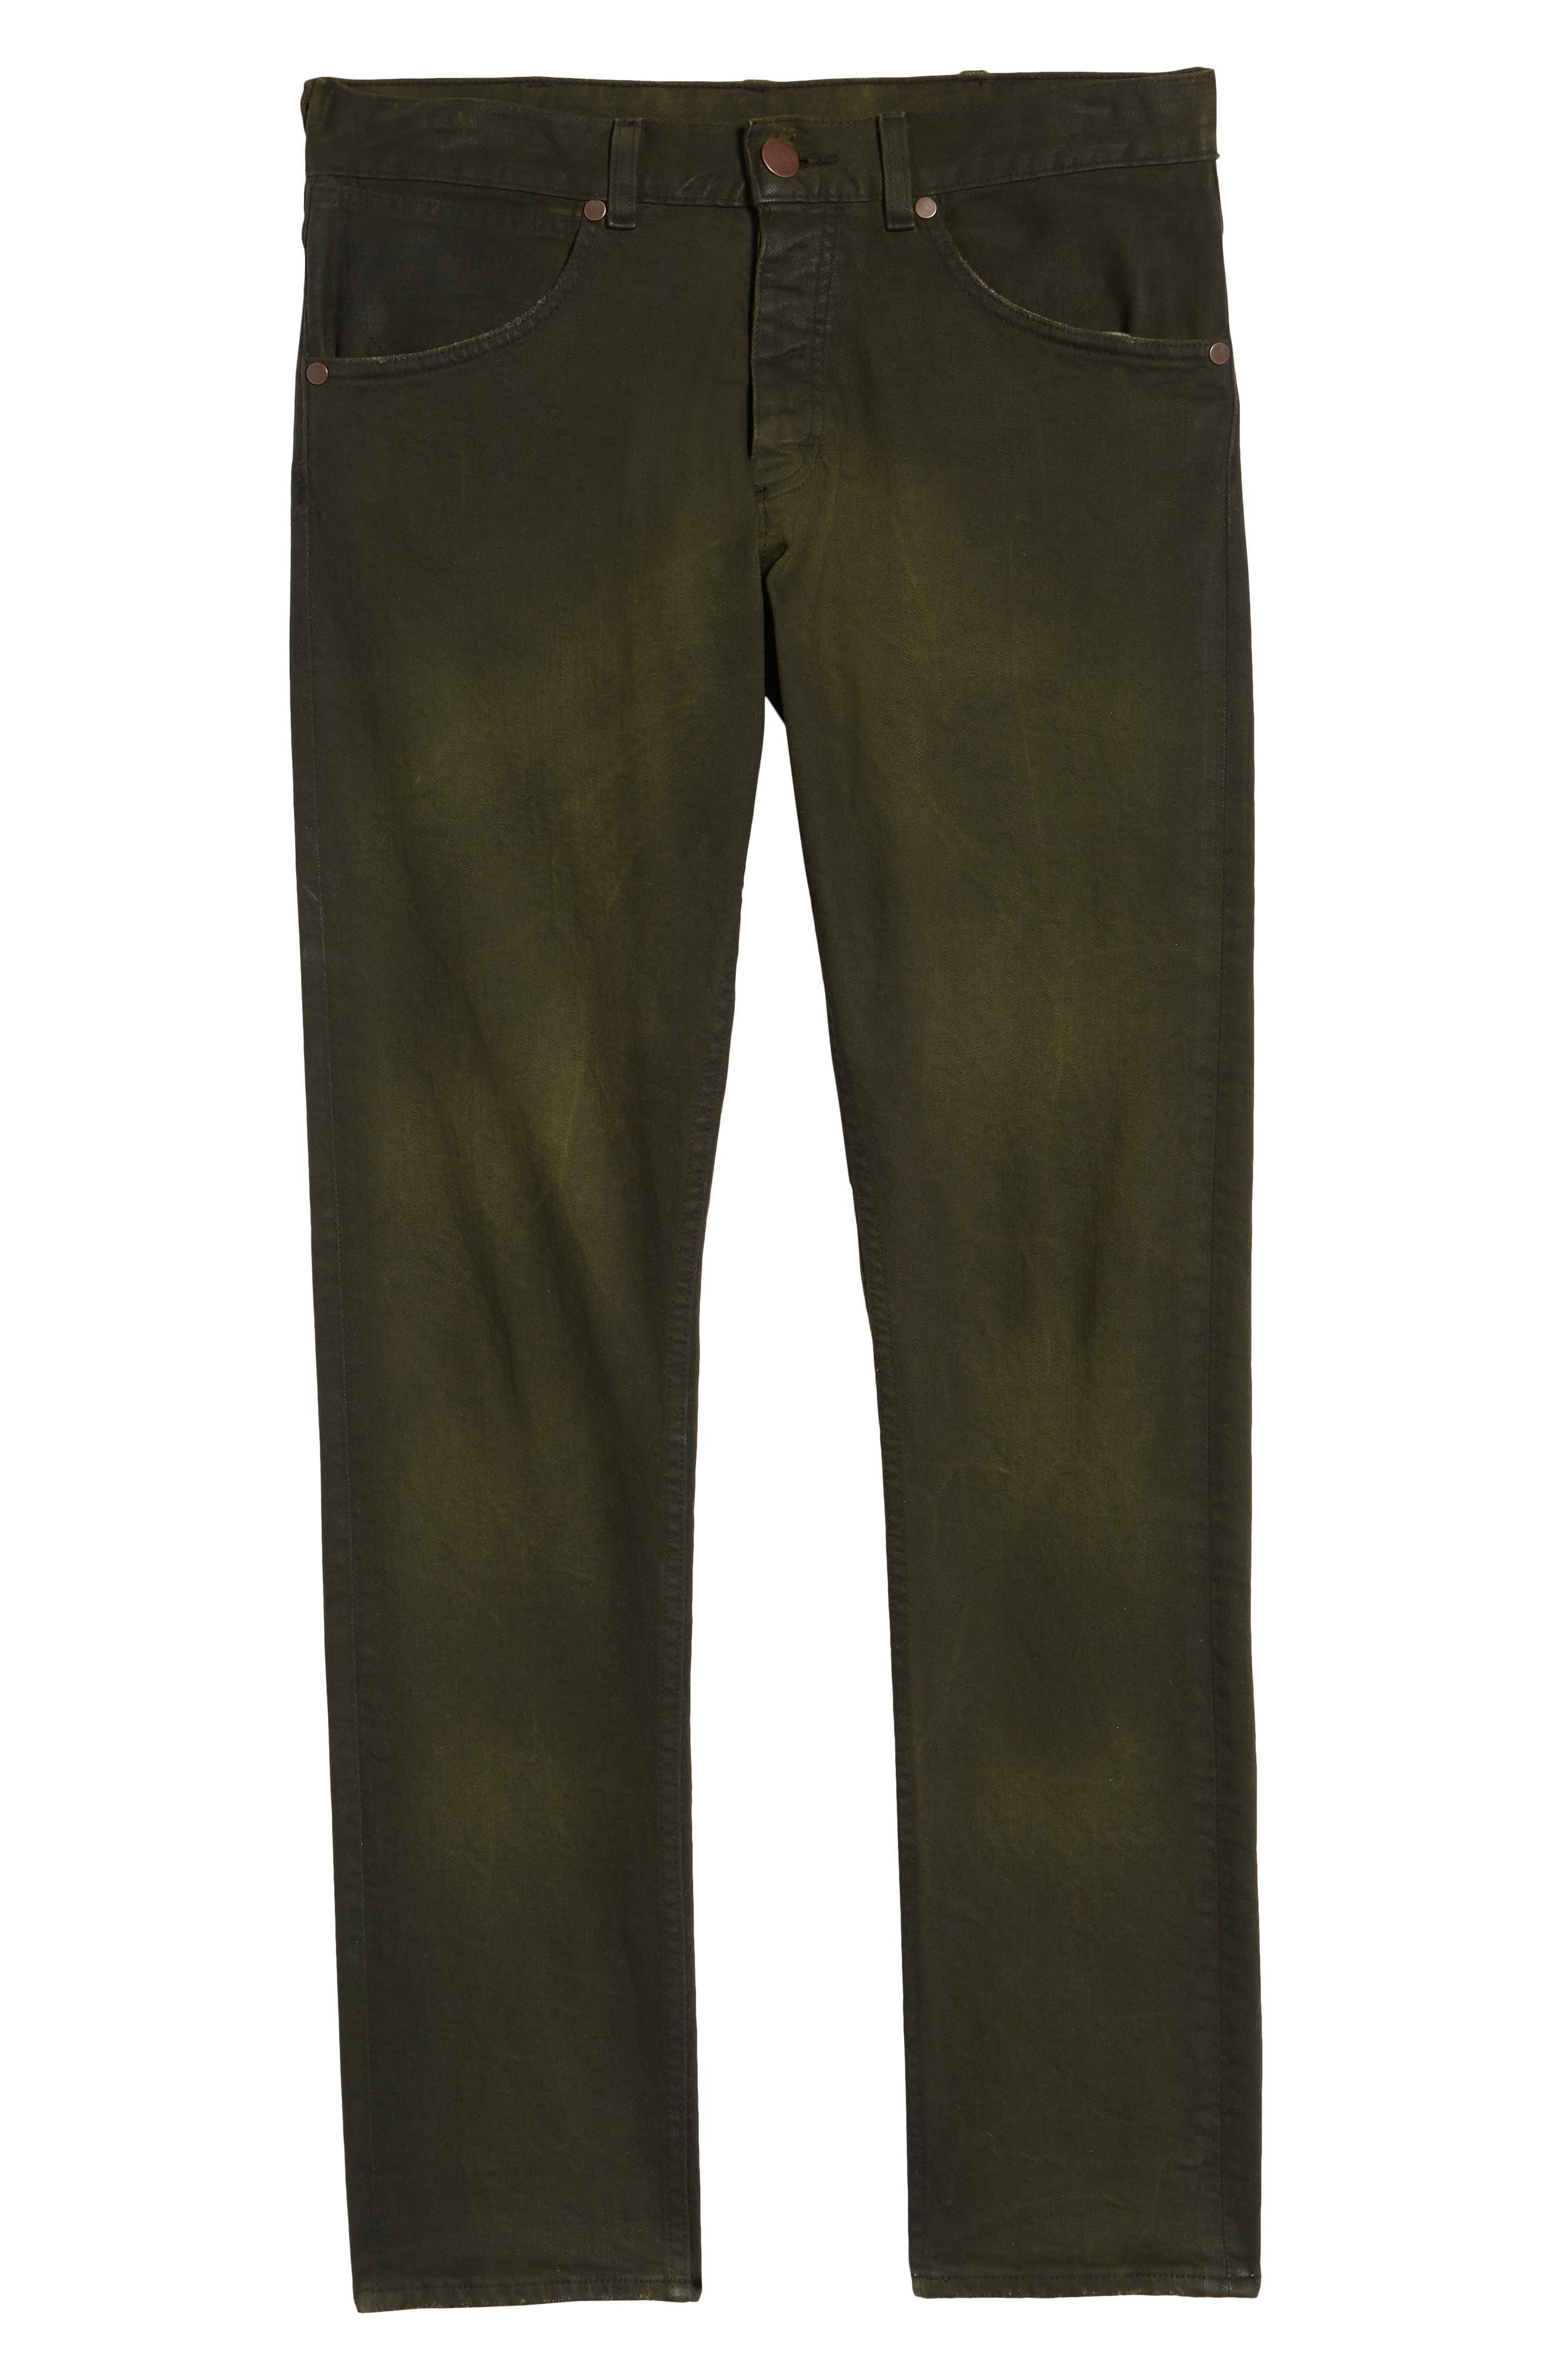 Larston Slim Fit Jeans,                             Alternate thumbnail 6, color,                             ROVER GREEN